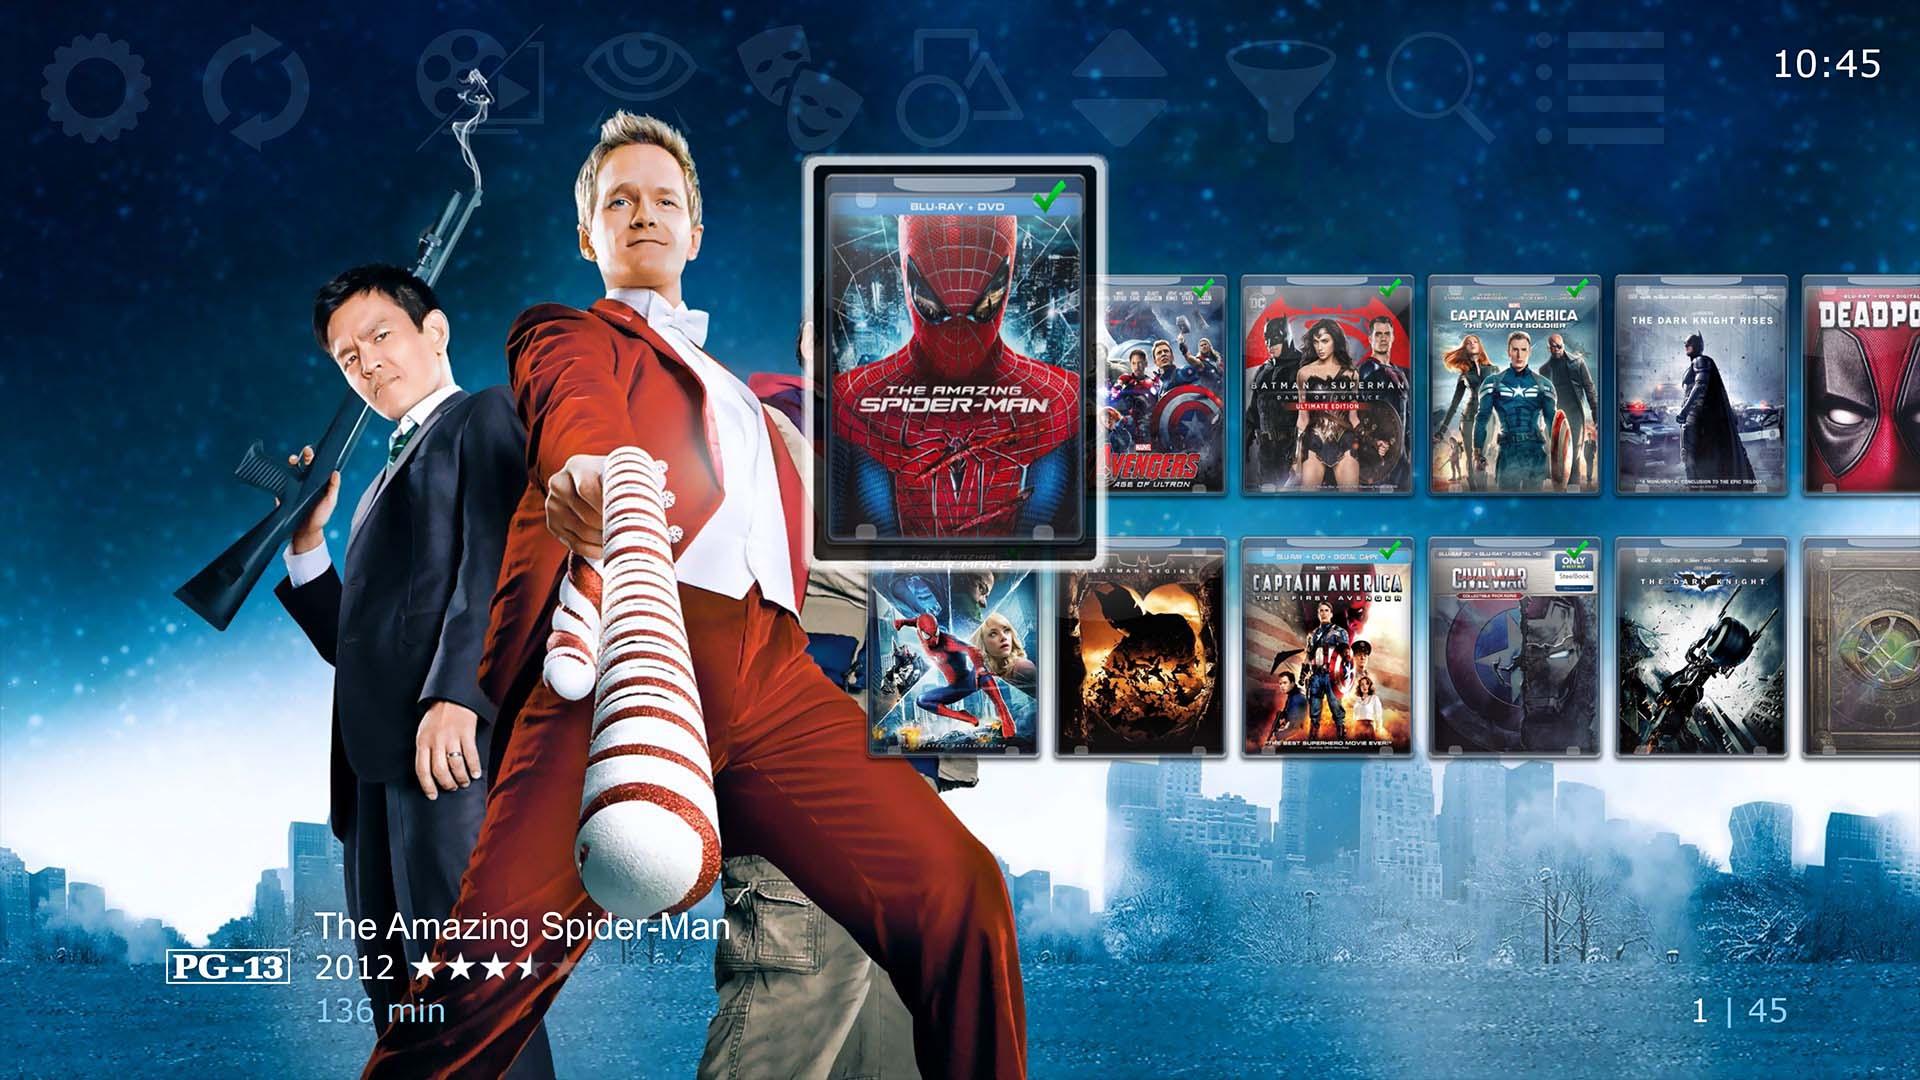 Chameleon MediaCenter Movie Library in 2-Cover Row mode